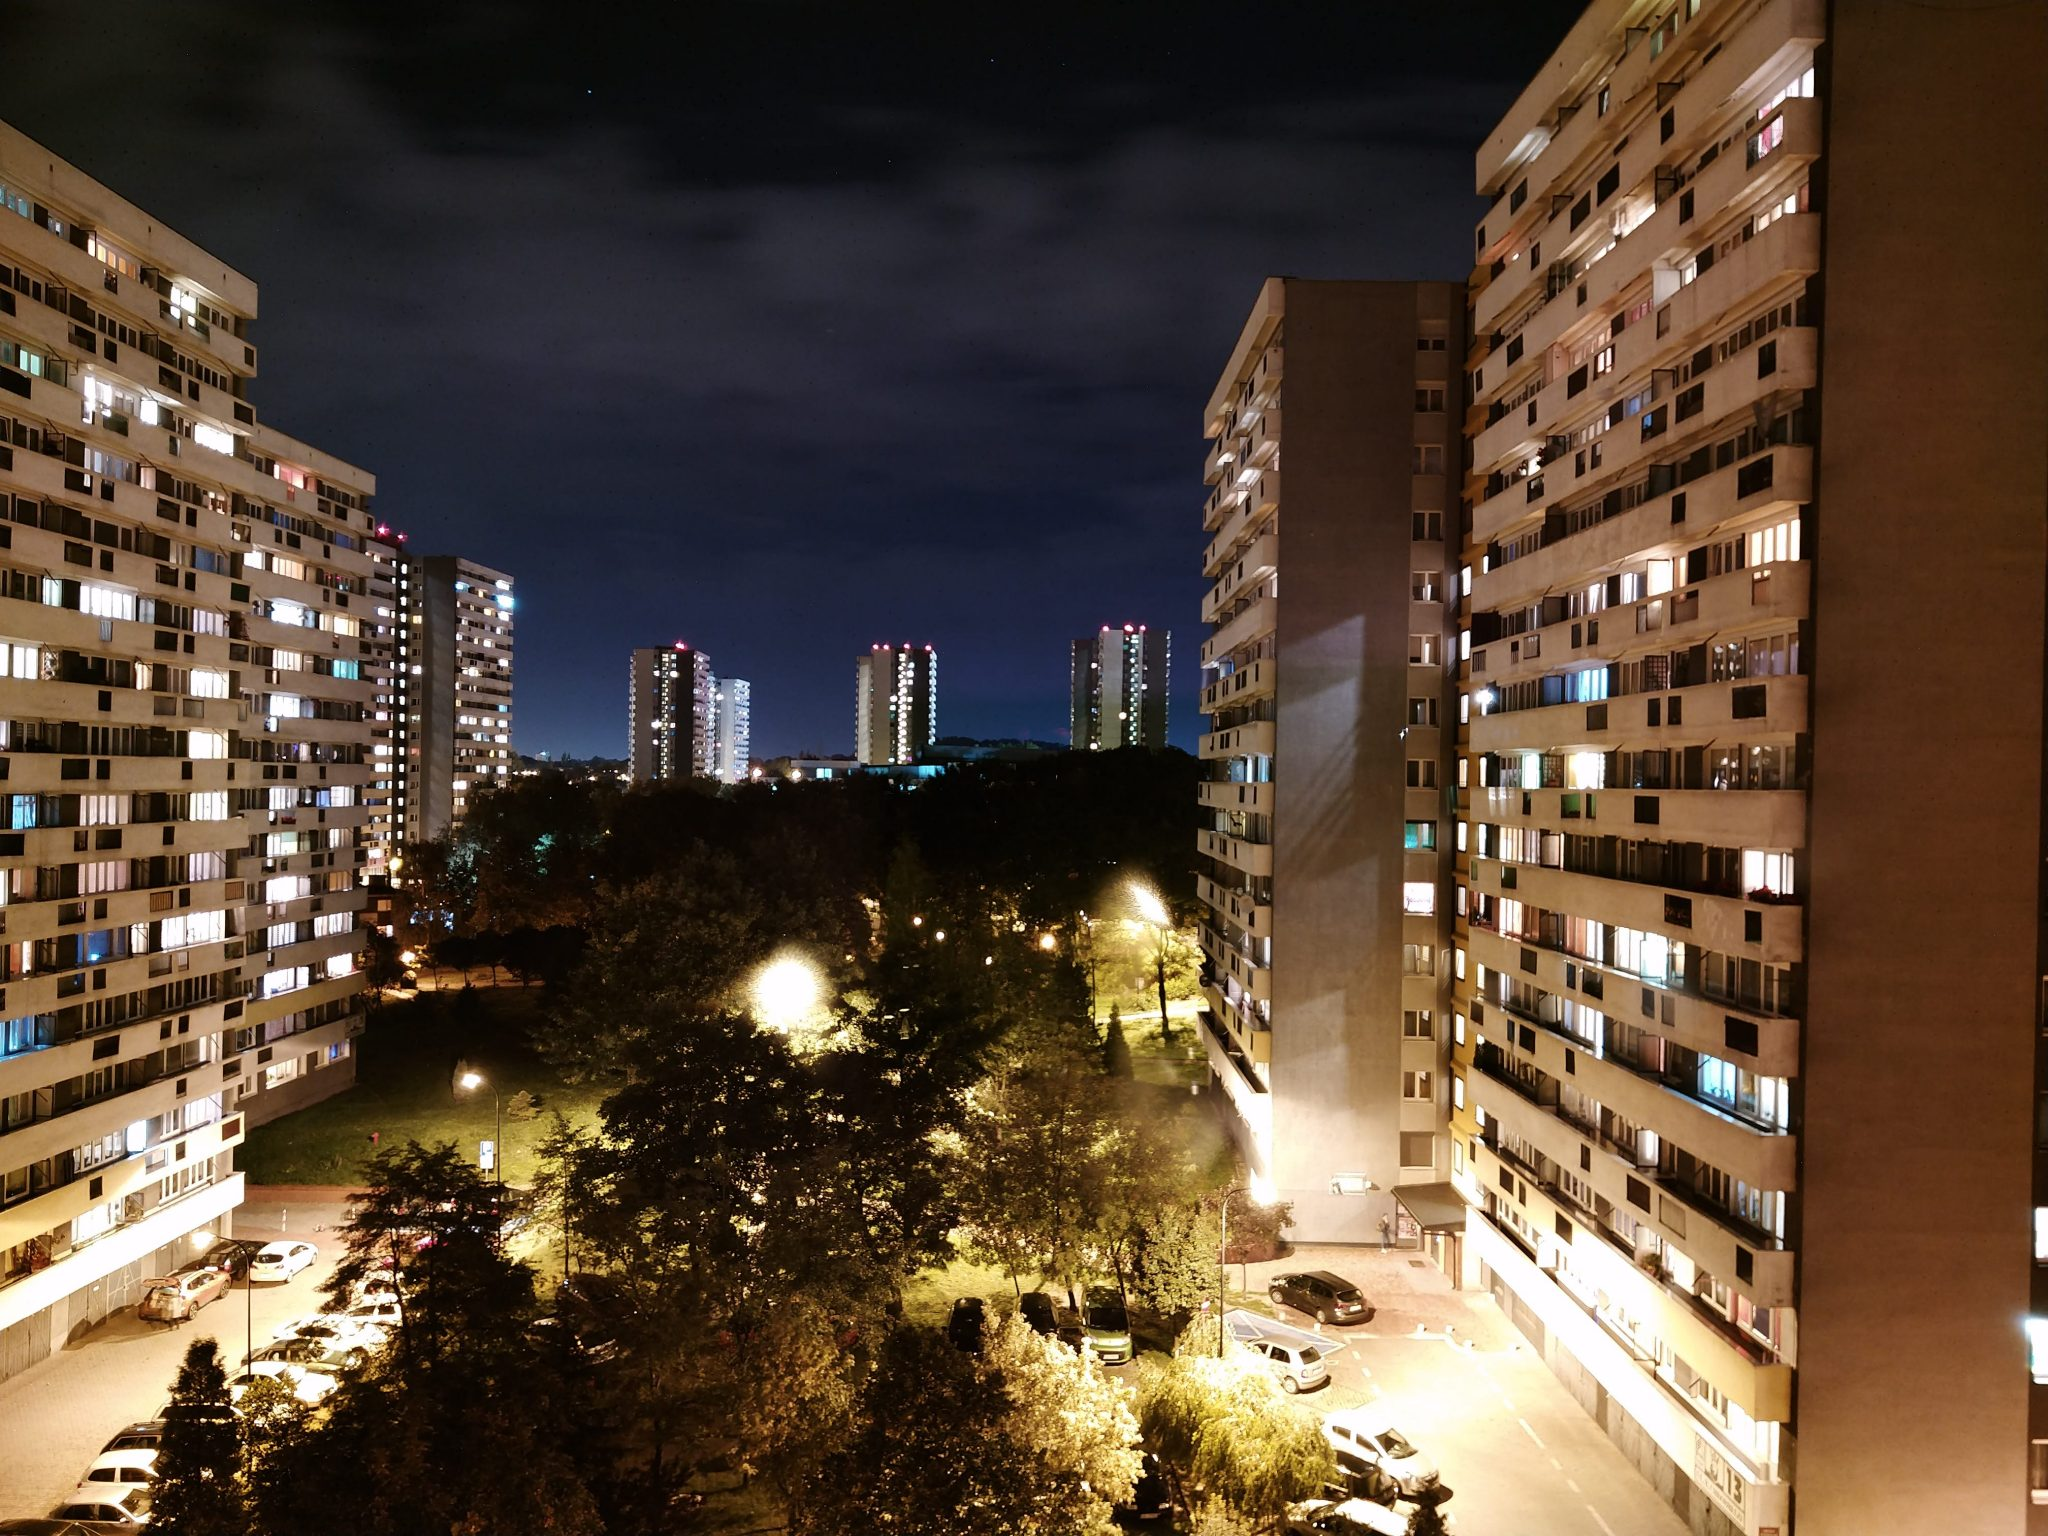 Zdjęcia nocne - Sharp Aquos D10